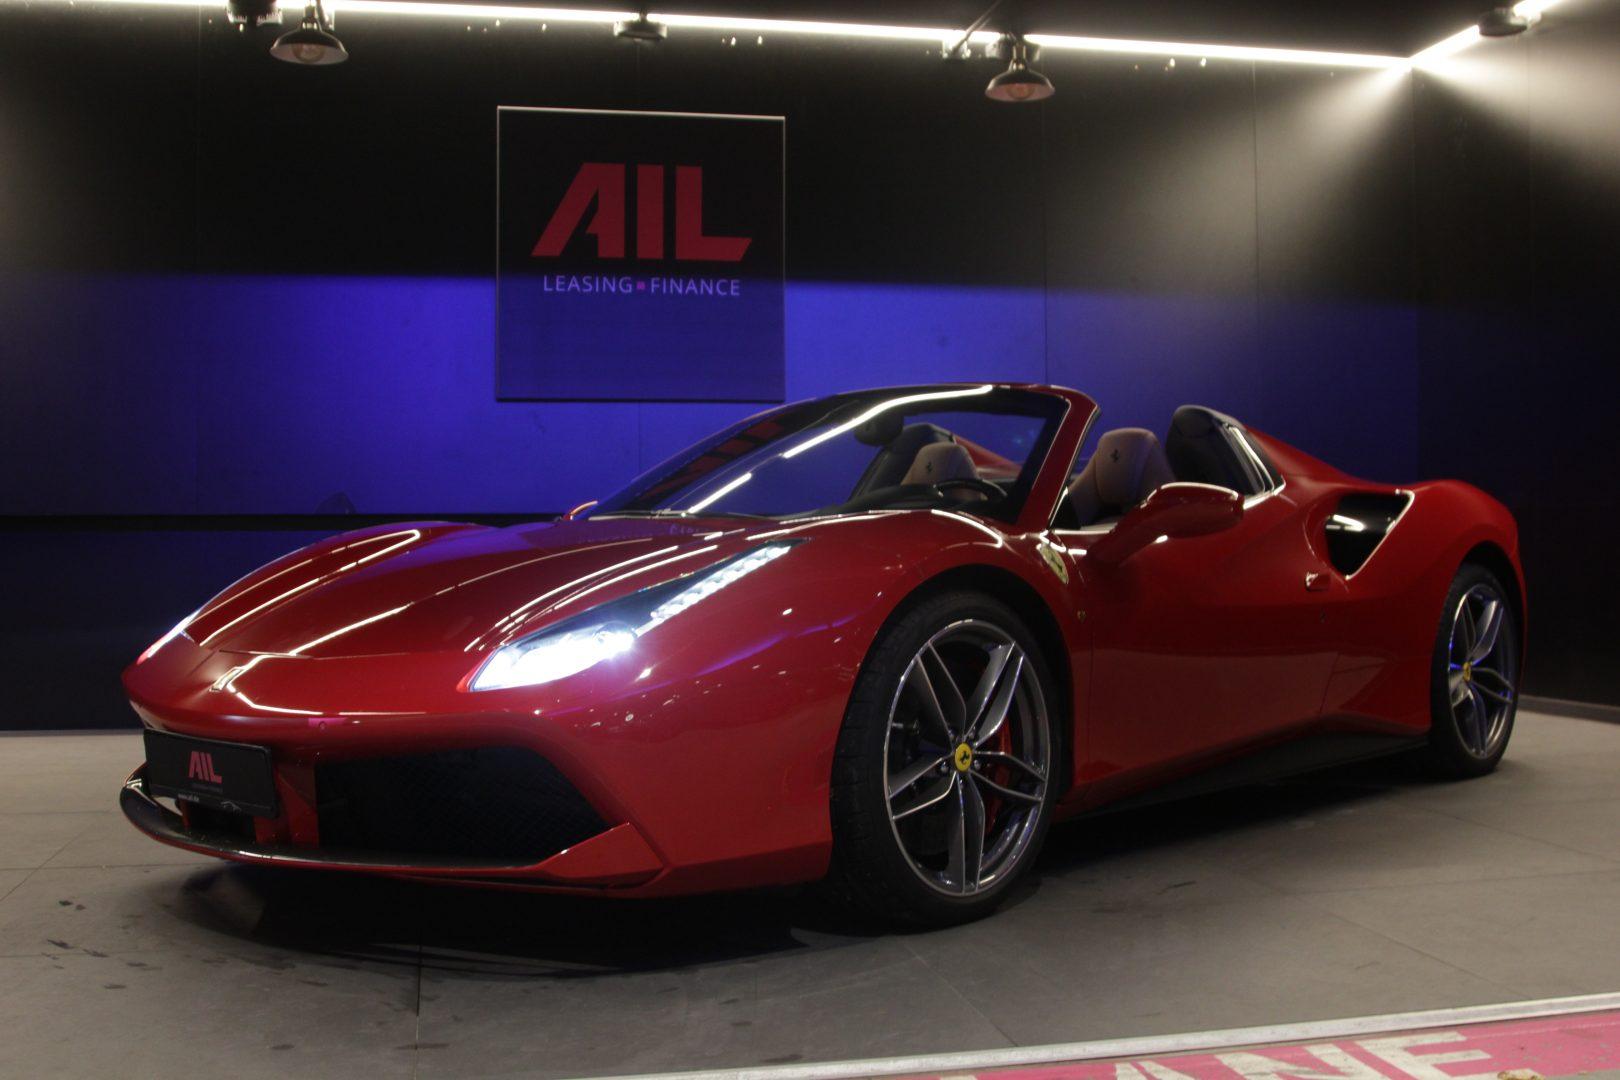 AIL Ferrari 488 Spider 4